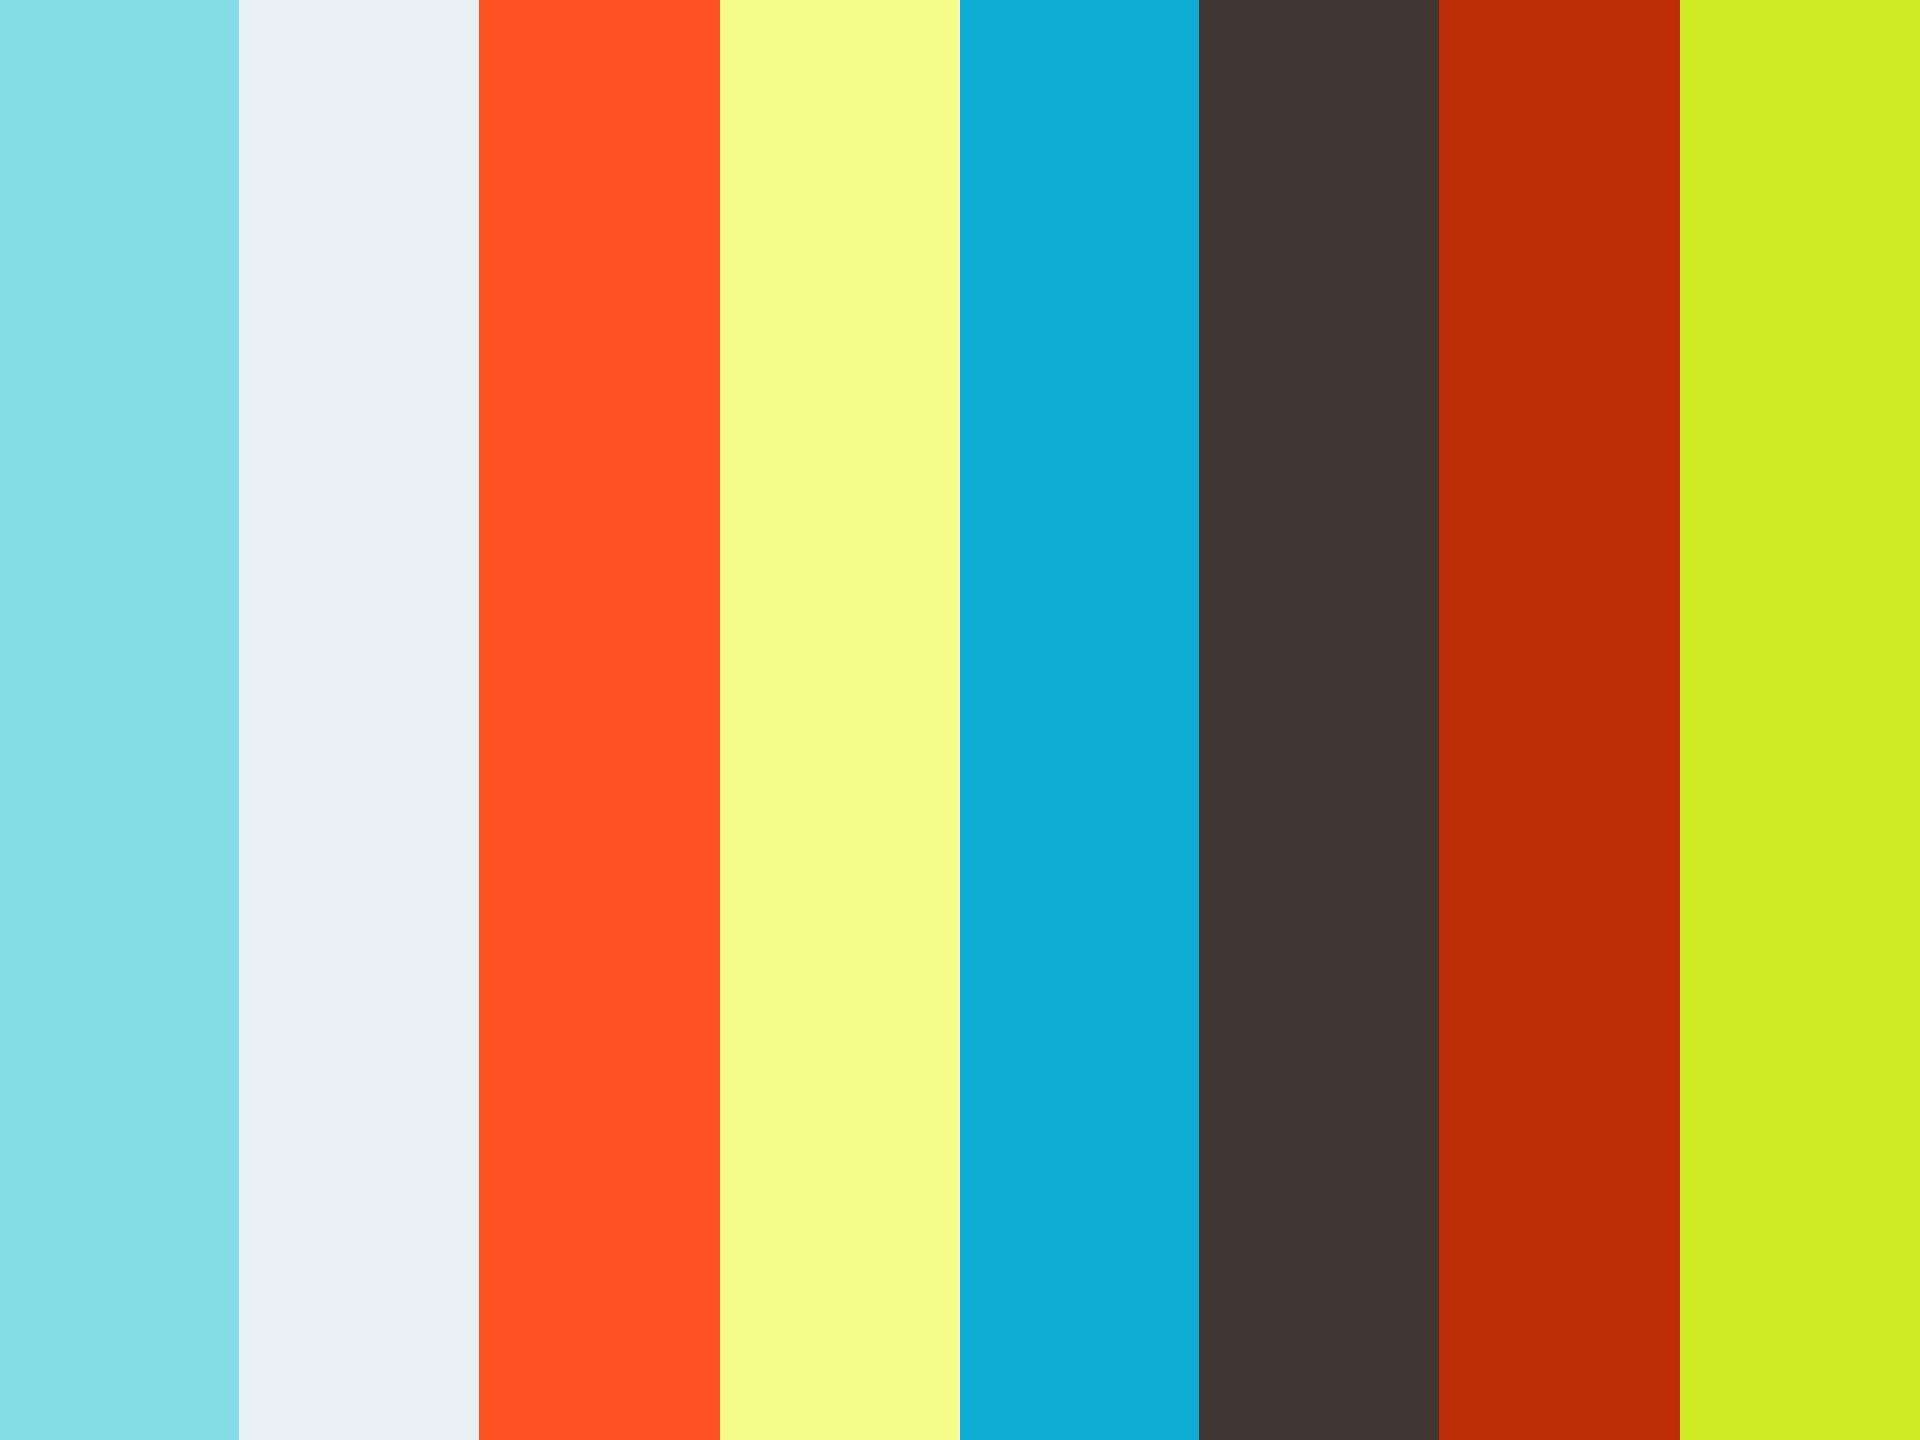 schwarz & weiss creative agency on vimeo, Hause ideen